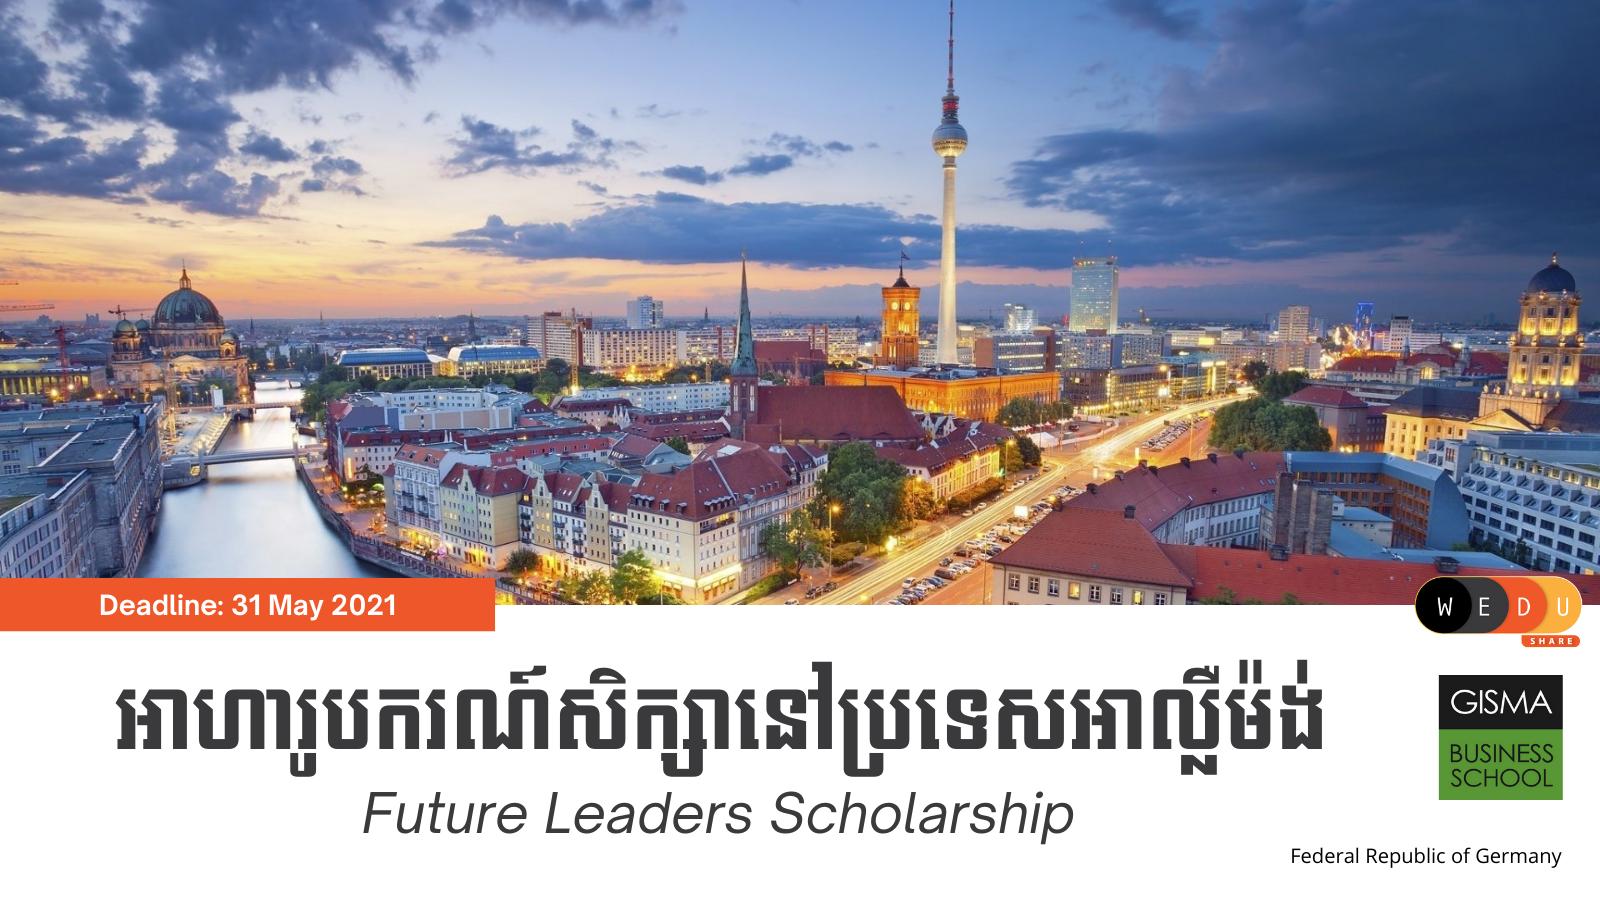 Future Leaders Scholarship